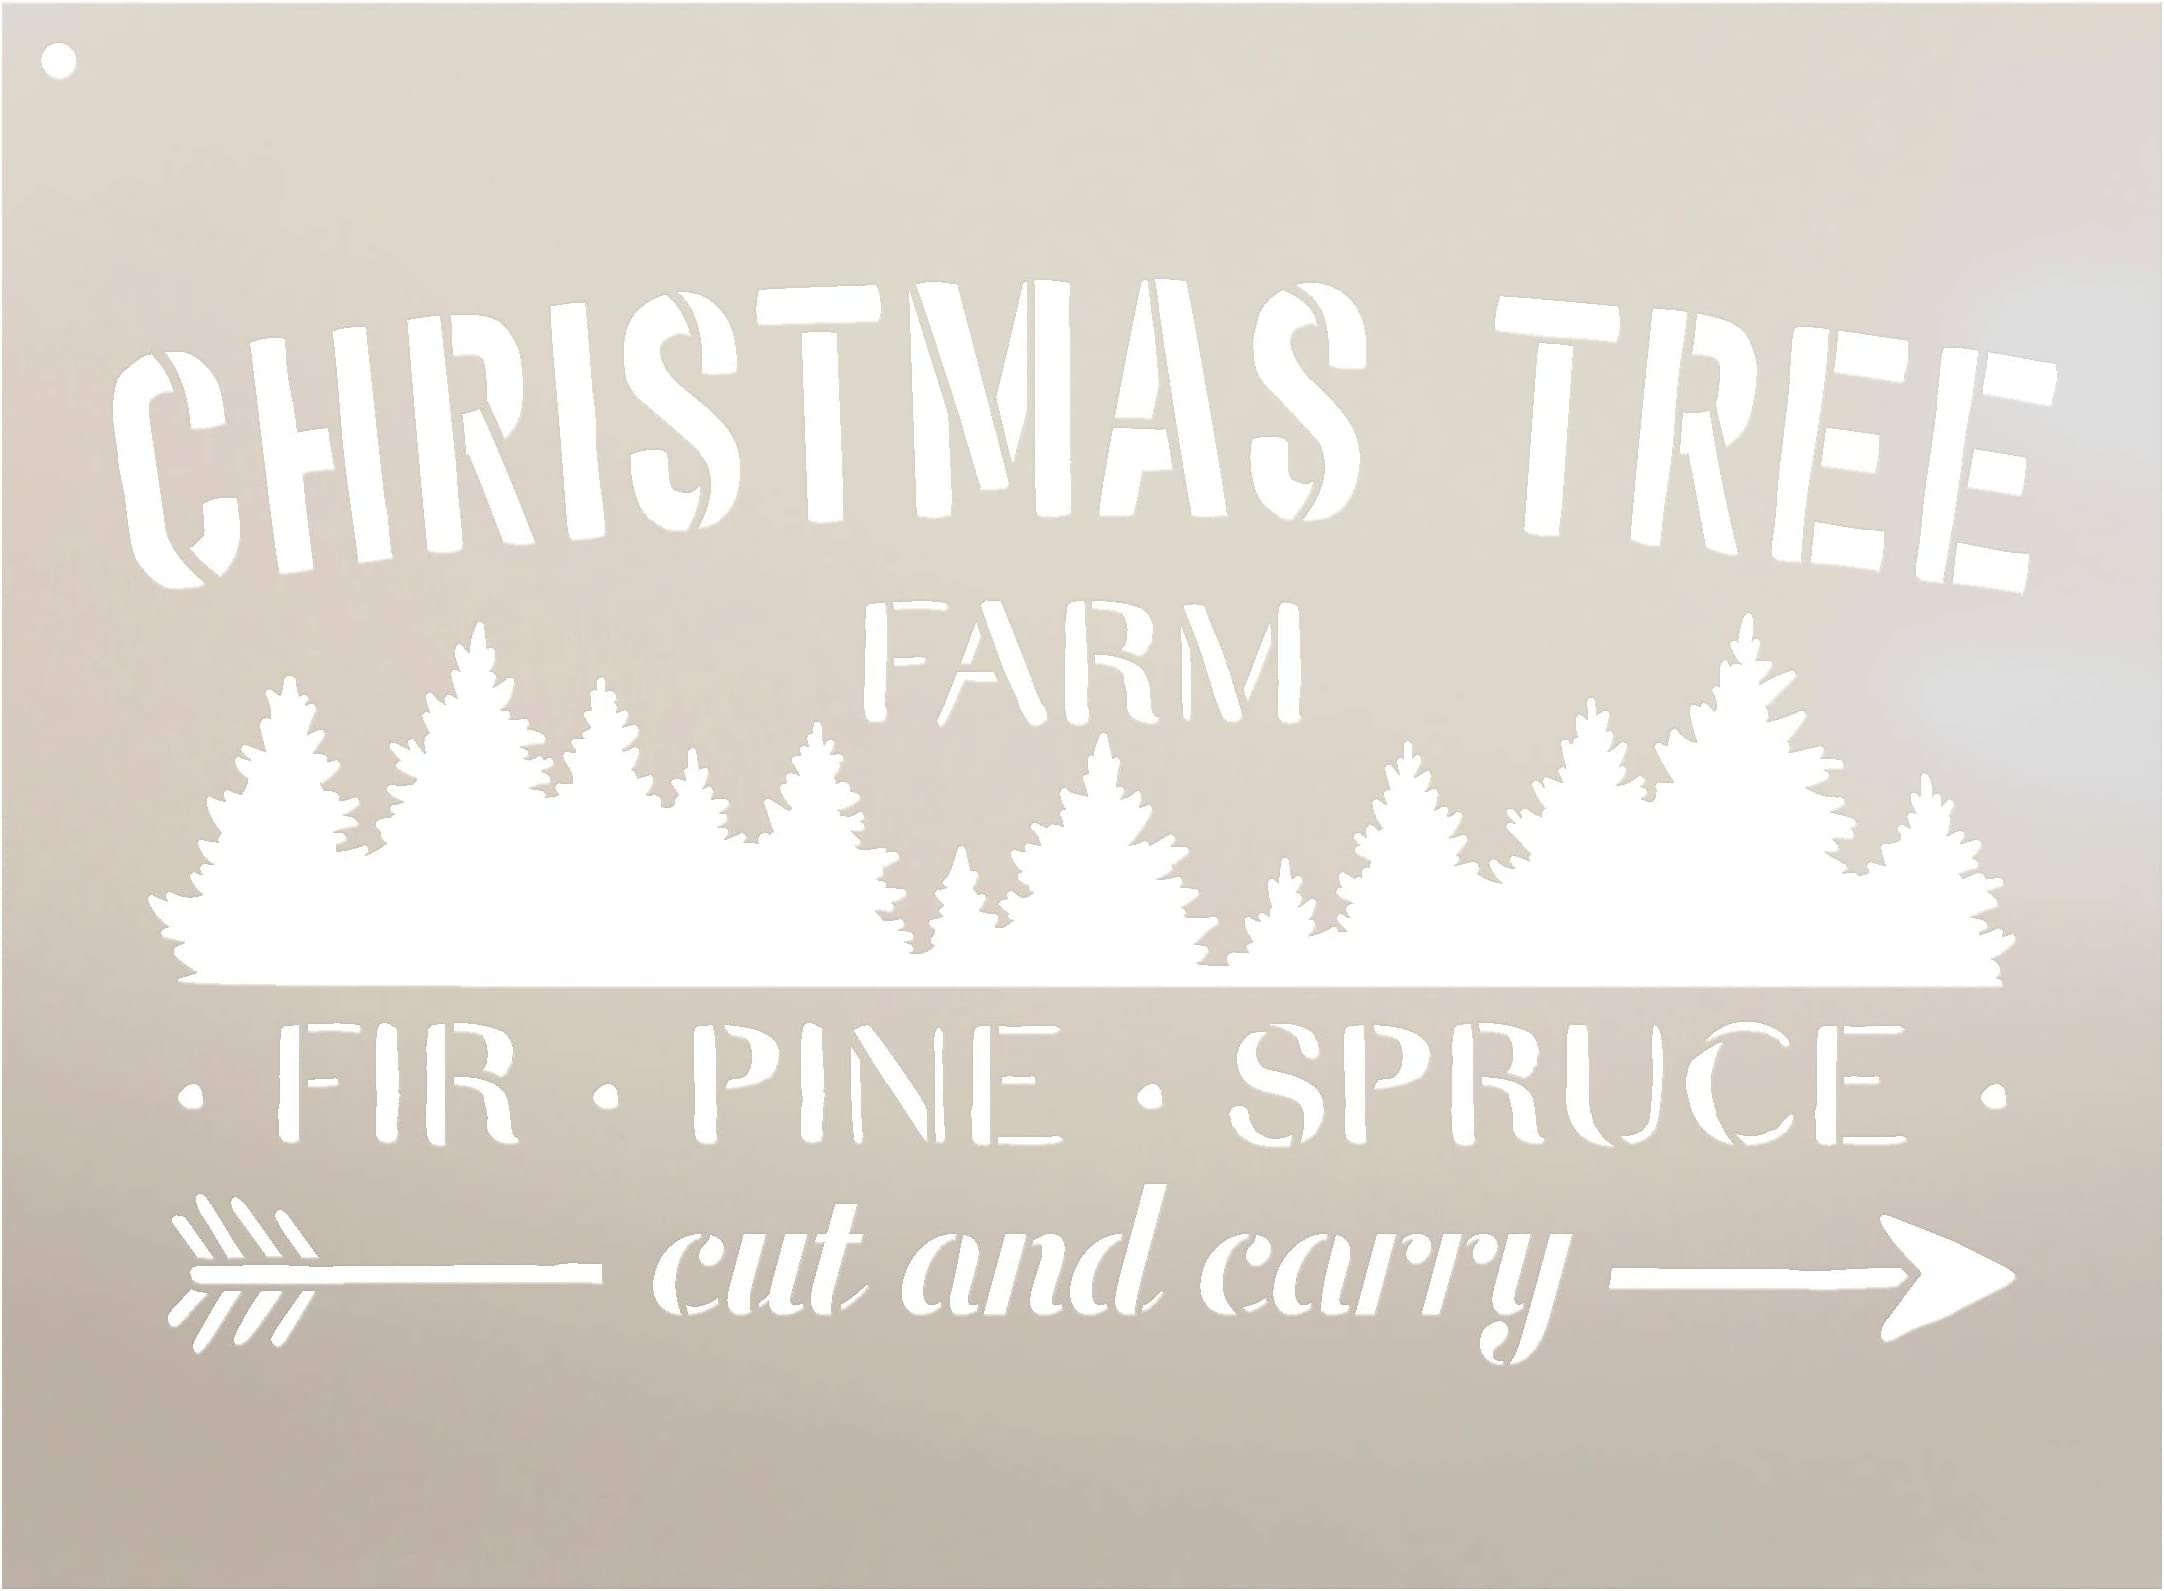 Christmas Tree Farm Stencil by StudioR12 | Fir Pine Spruce Arrow | Reusable Mylar Template Paint Wood Sign Craft Vintage Winter Holiday Home Decor | Rustic DIY Seasonal Country Farmhouse Select Size